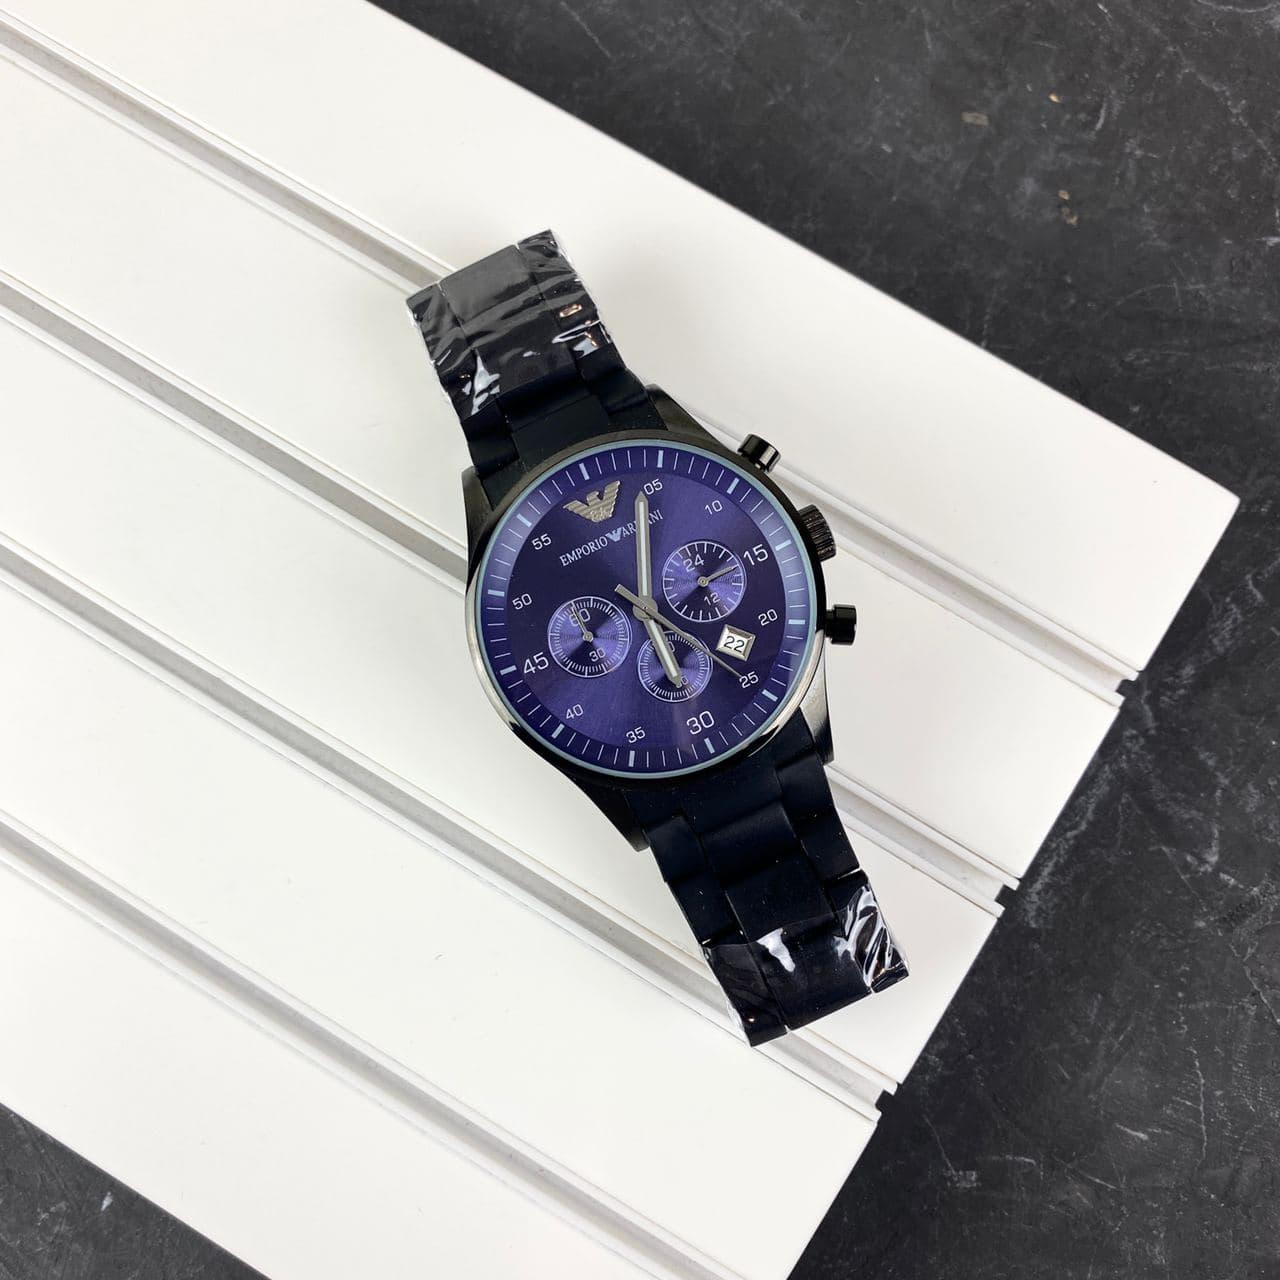 Мужские наручные часы Emporio Armani AR-5905 Black-Blue Silicone